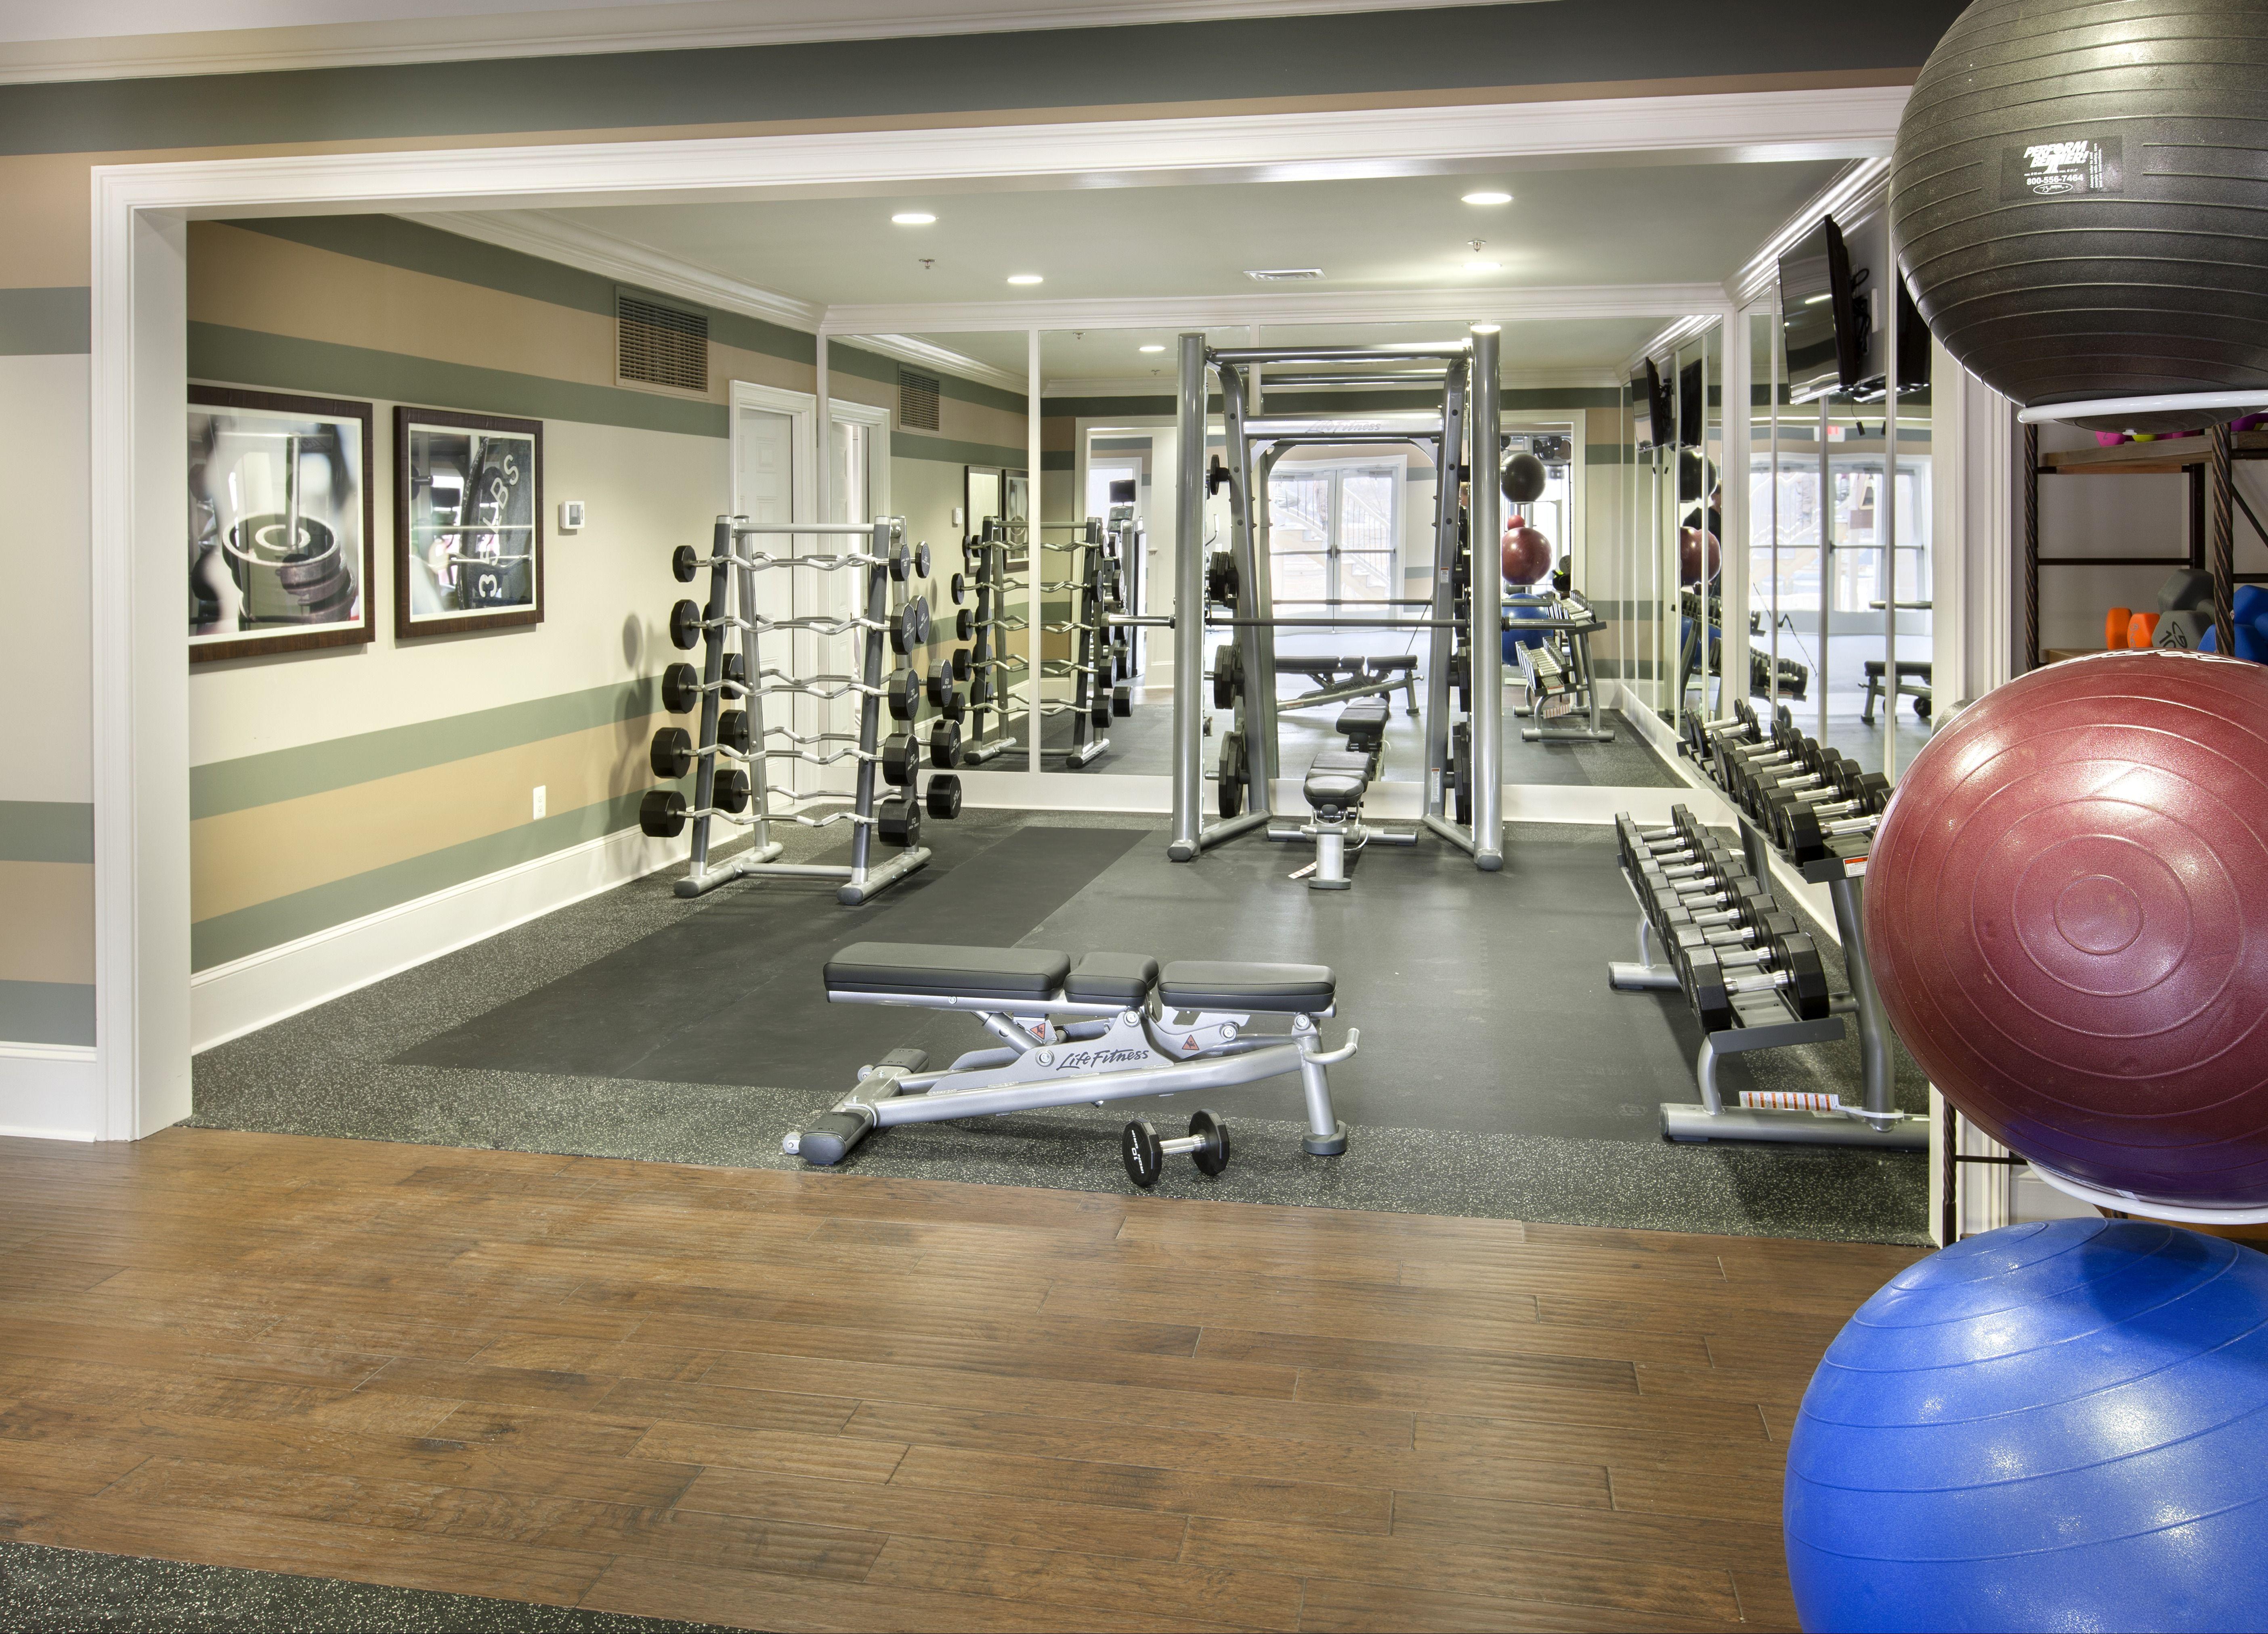 Luxury Home Amenities toll brothers at liseter, pa - gym | amenities | pinterest | bonus